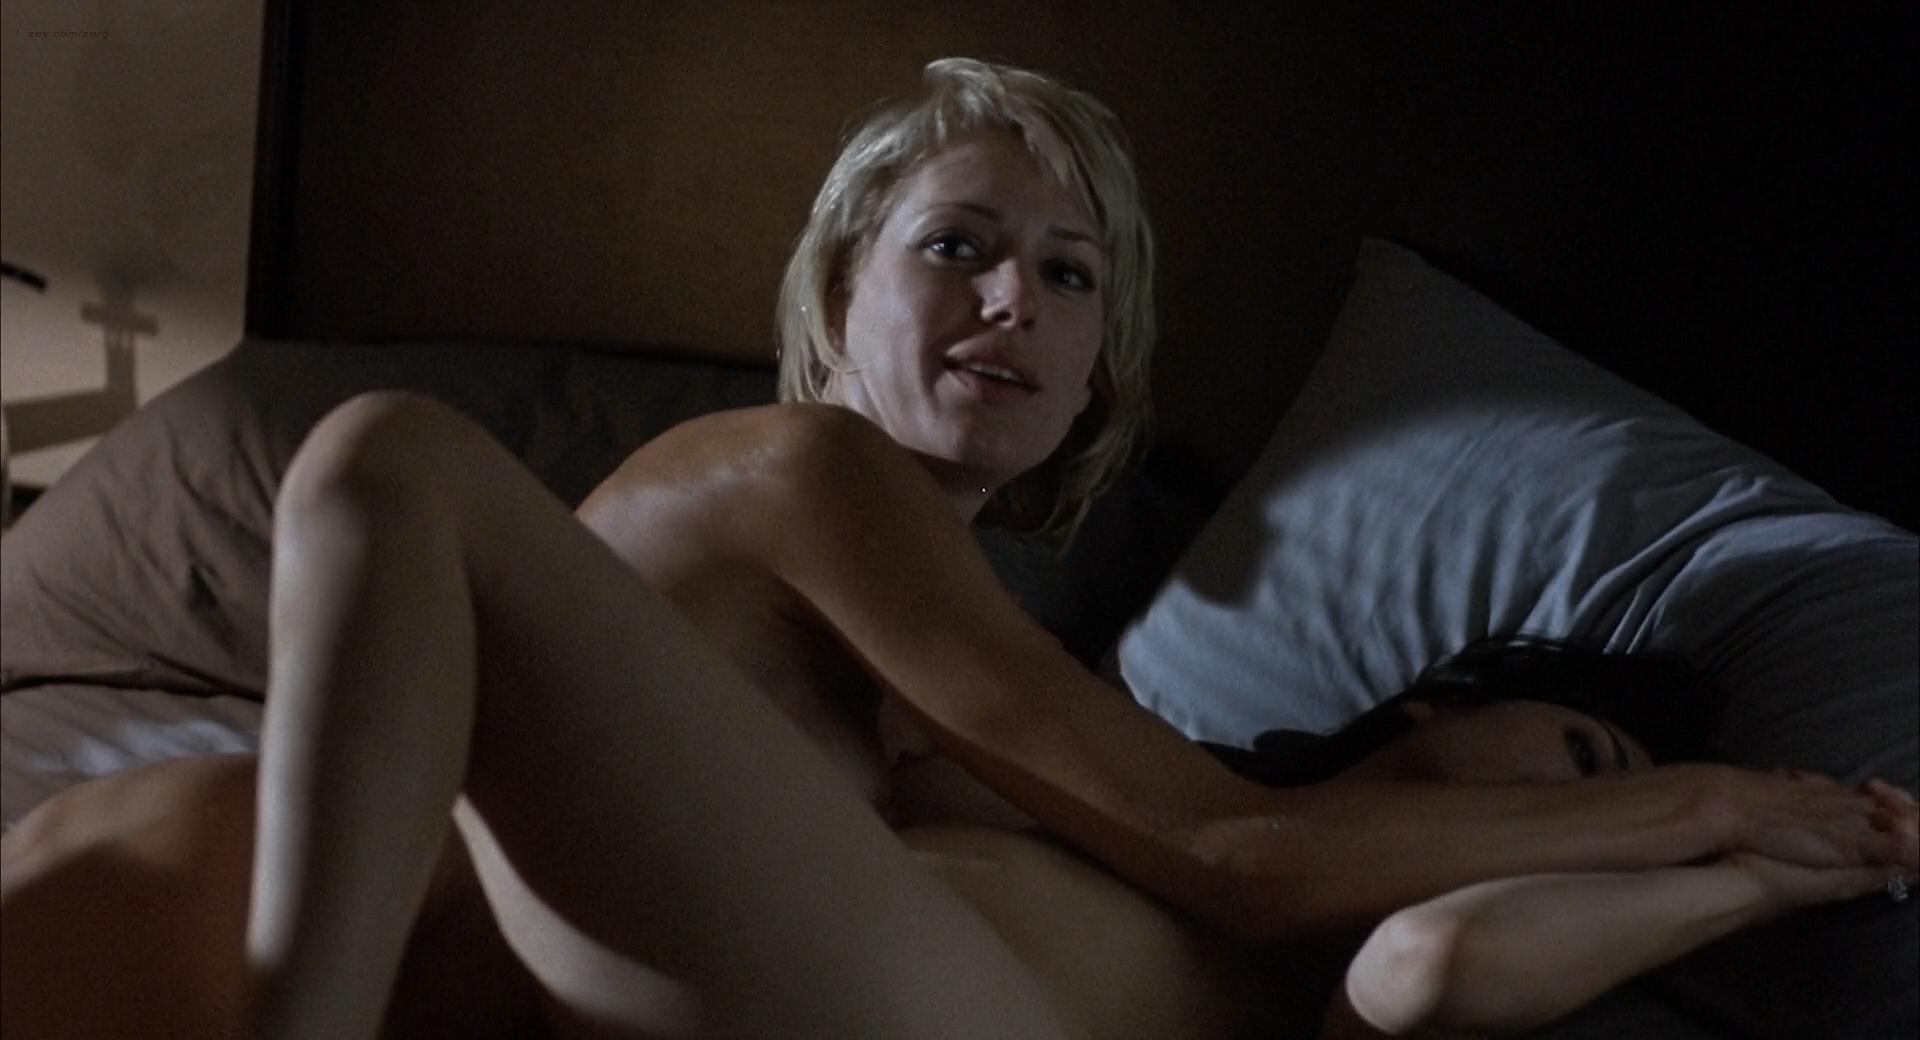 Lisa Zane nude sex Adrienne Leigh and Charisse Glenn nude sex threesome - Bad Influence (1990) HD 1080p (9)